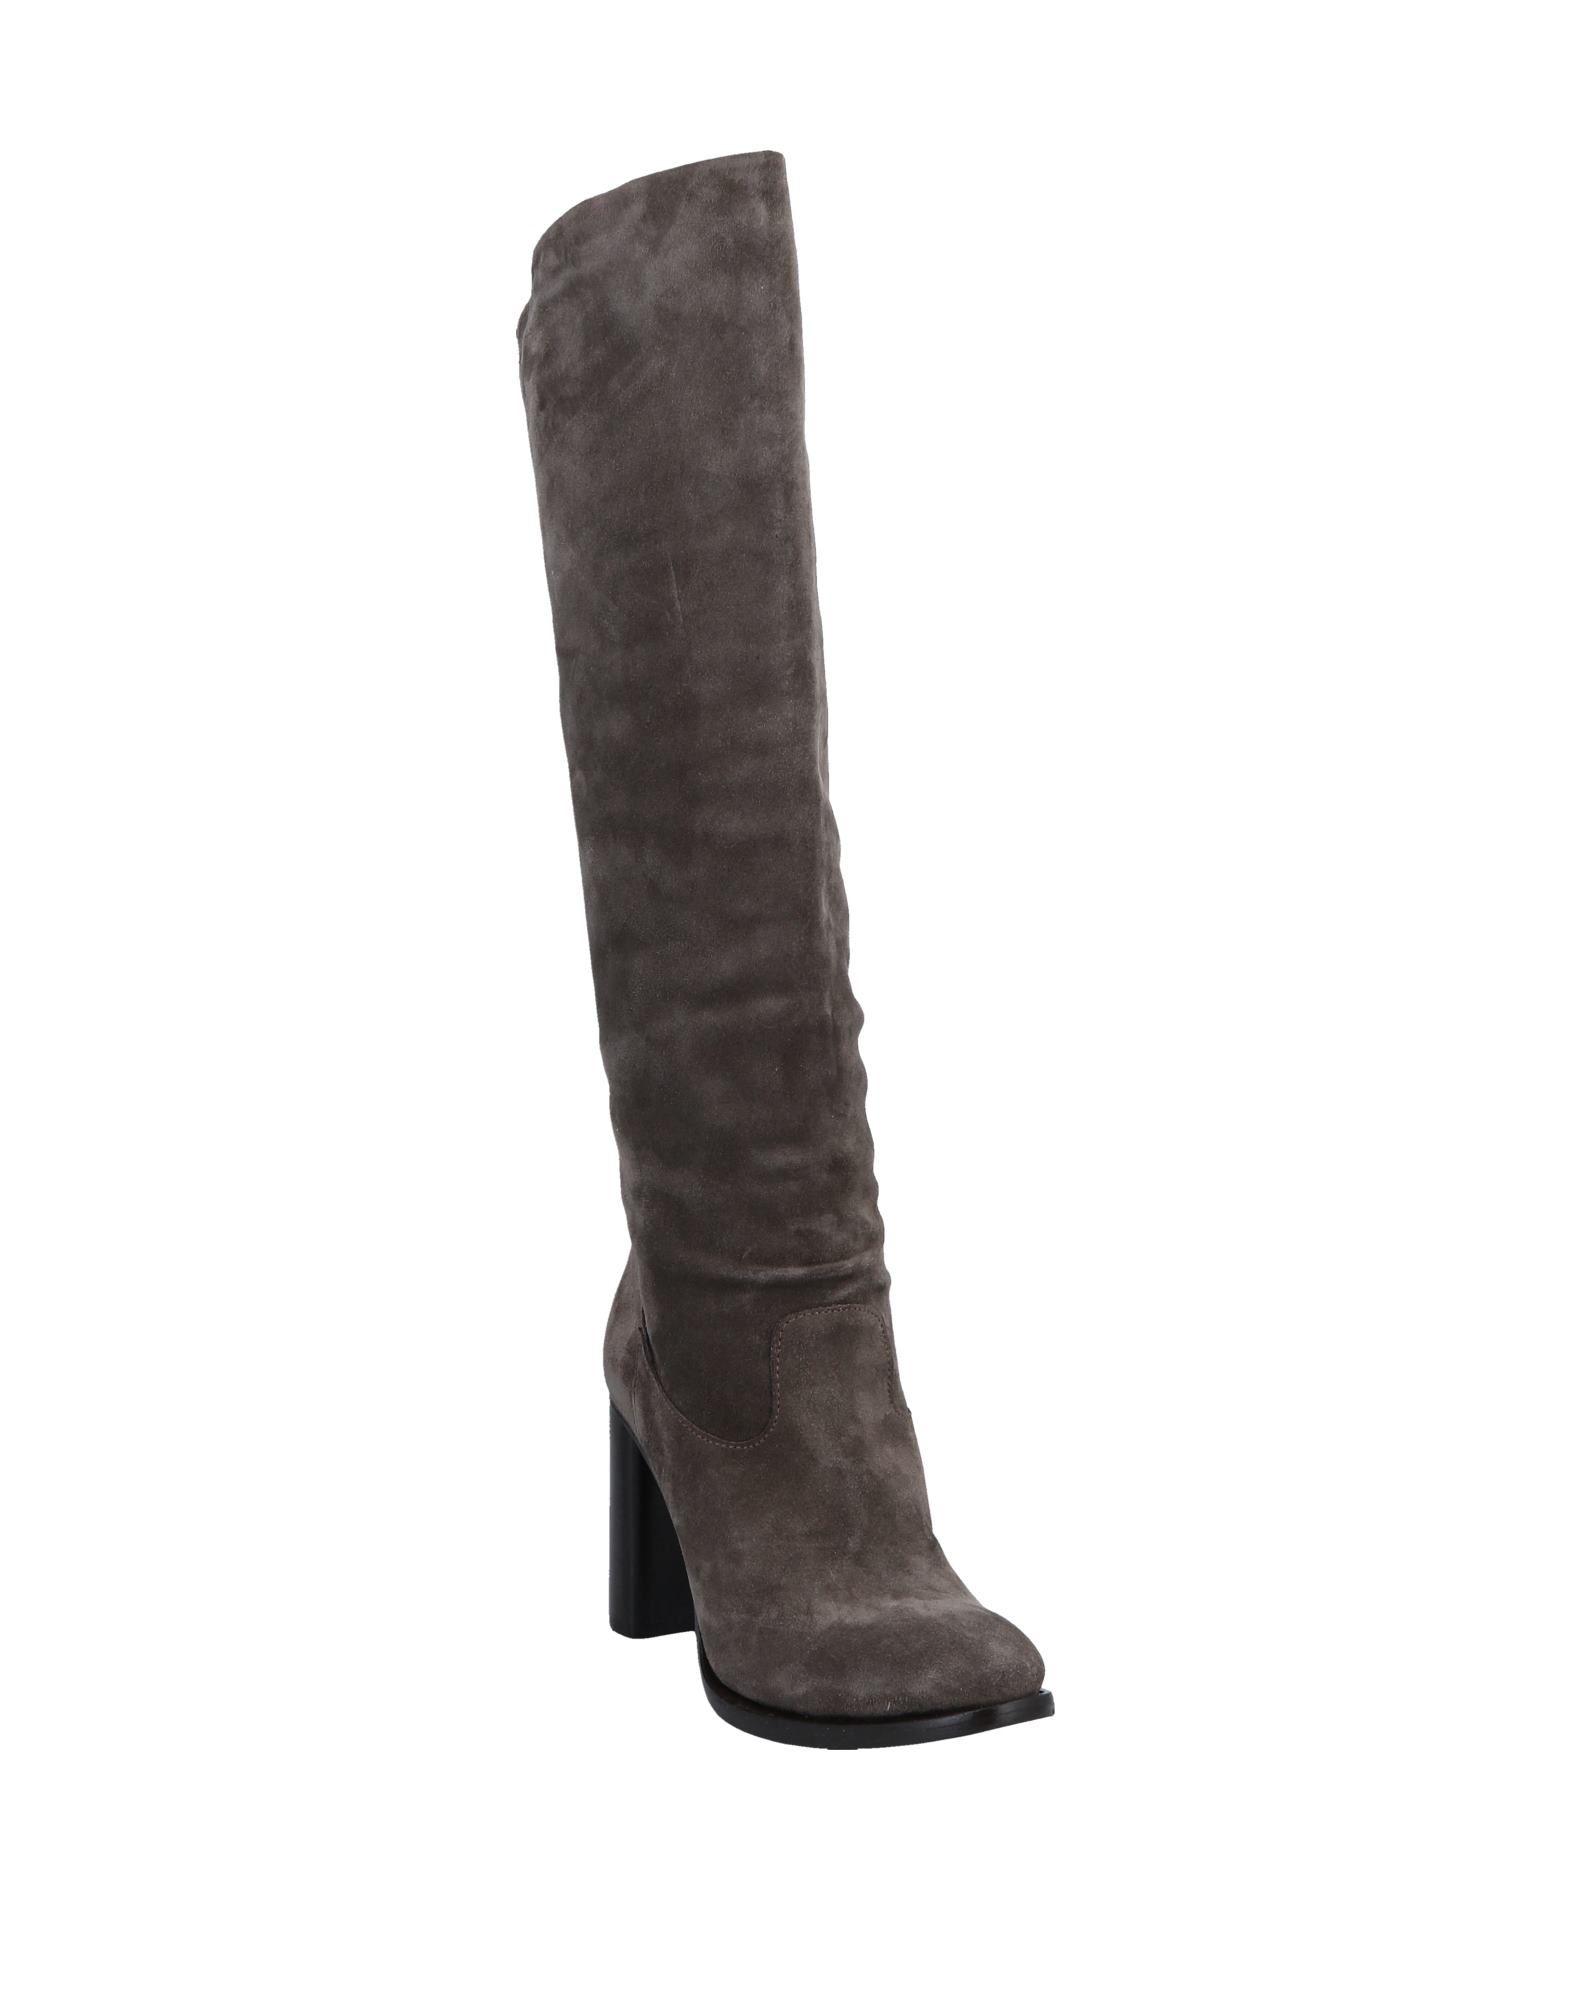 Stilvolle Fru.It billige Schuhe Fru.It Stilvolle Stiefel Damen  11555749WA 77579f